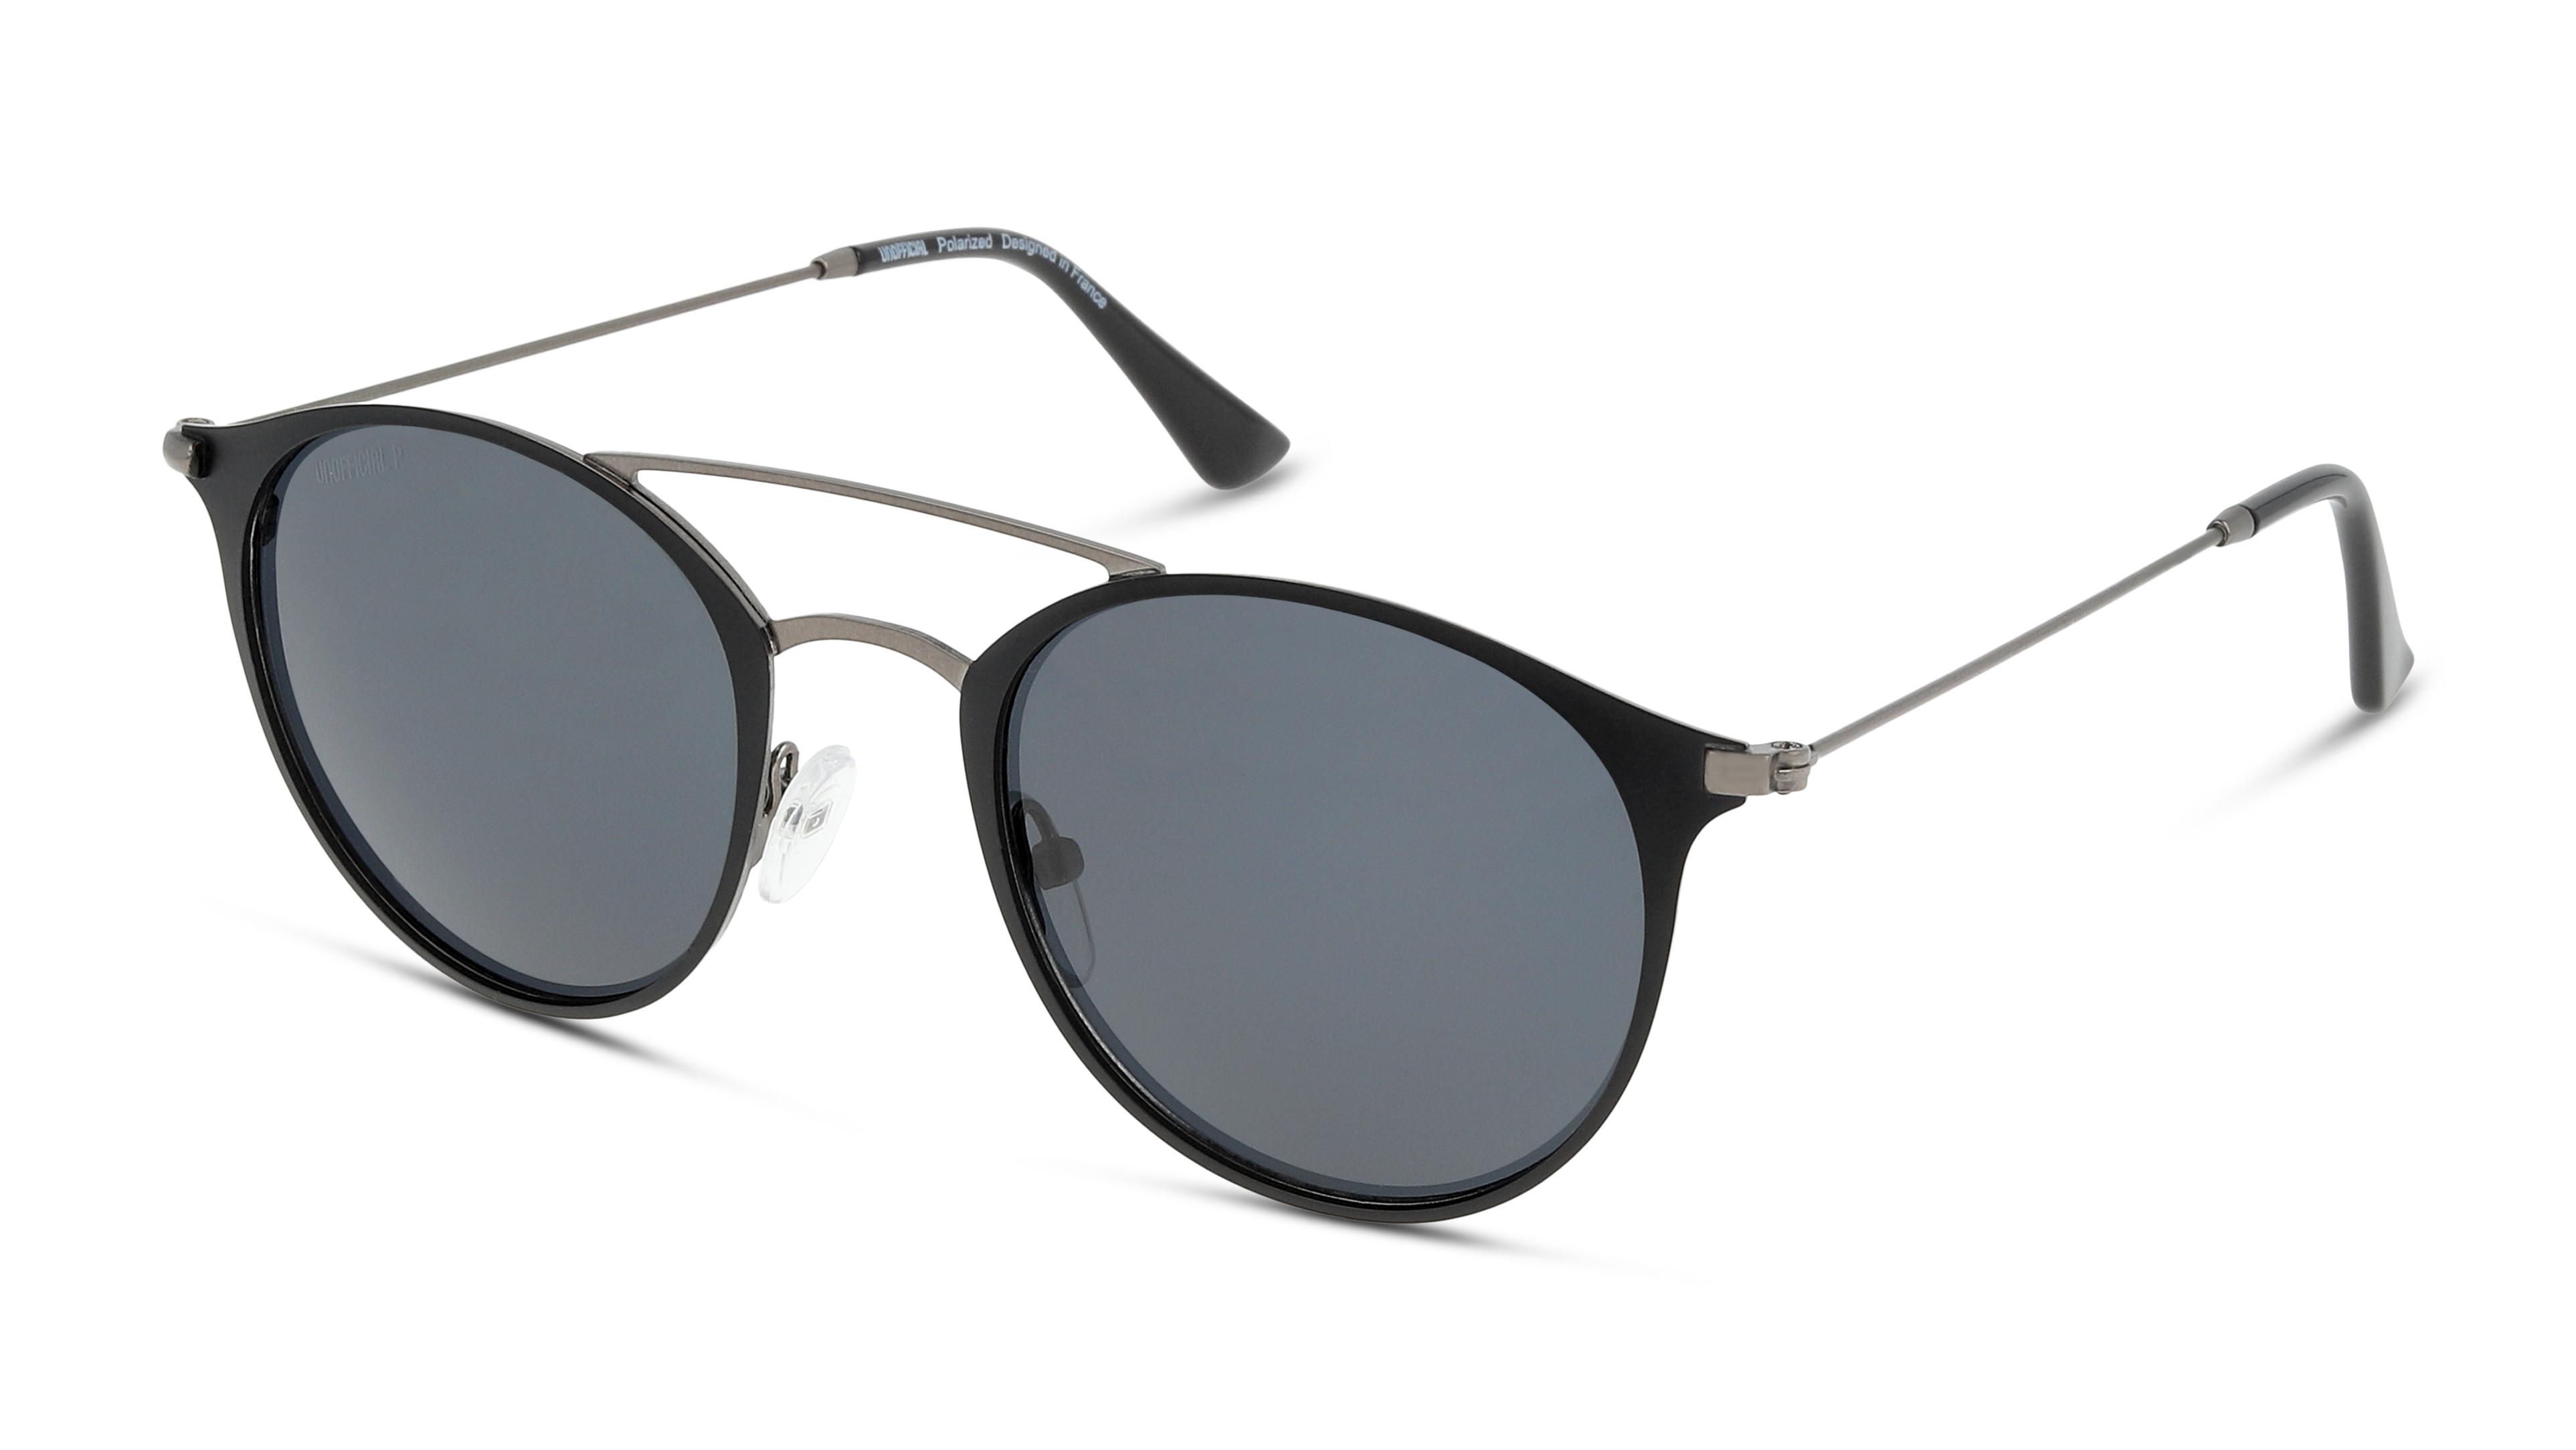 8719154742880-angle-03-unofficial-unsu0029p-eyewear-black-grey